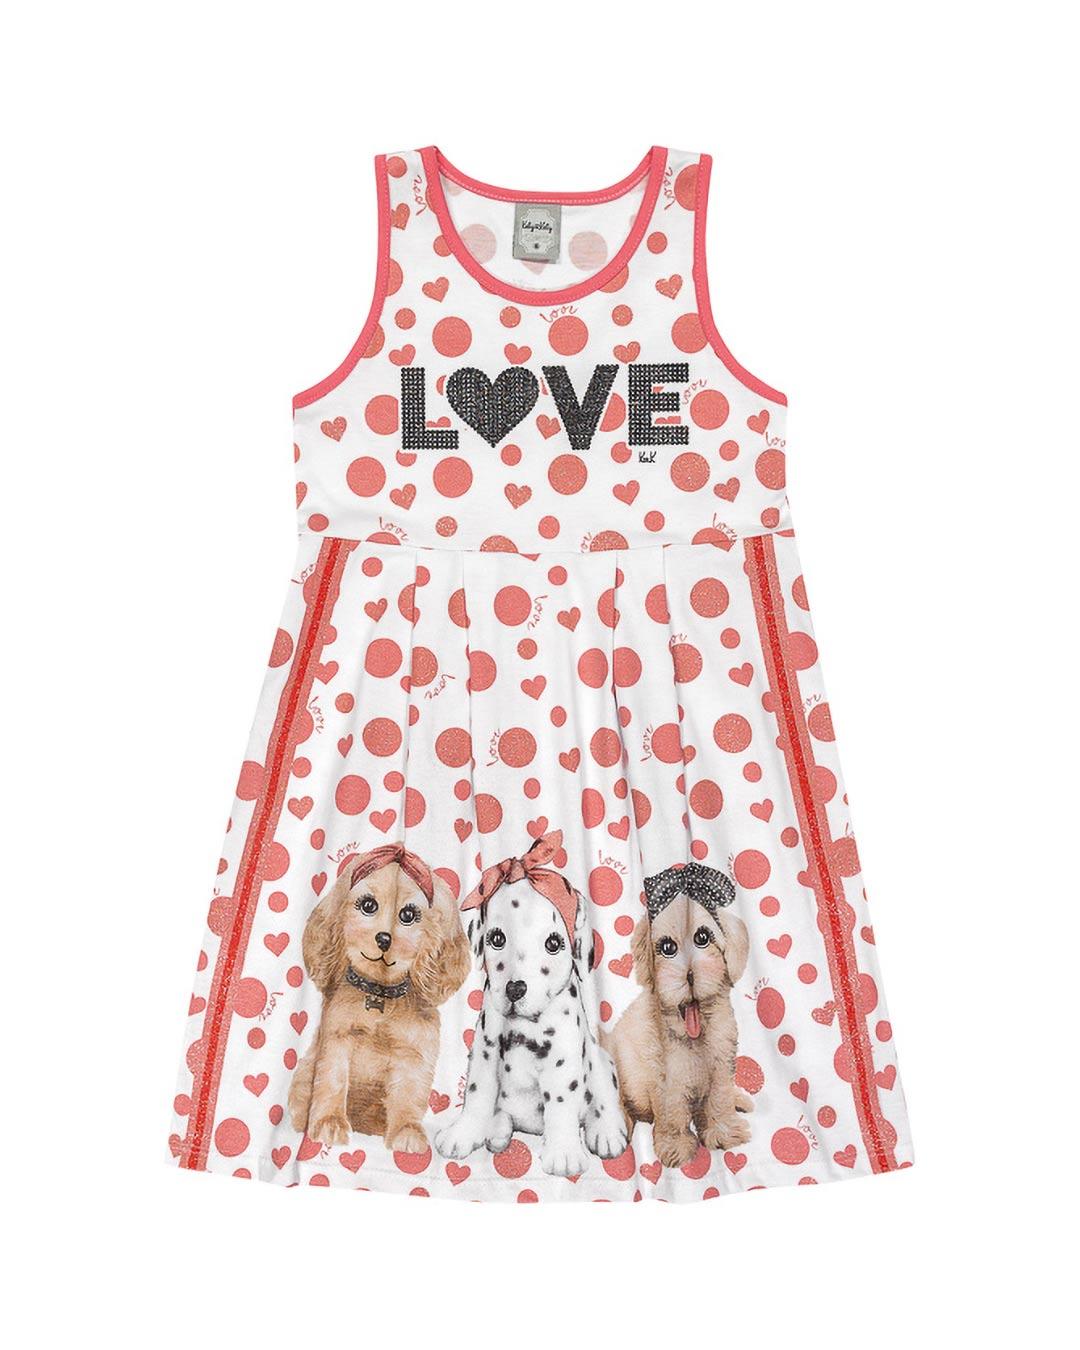 Vestido Infantil Love & Dog - Kely & Kety